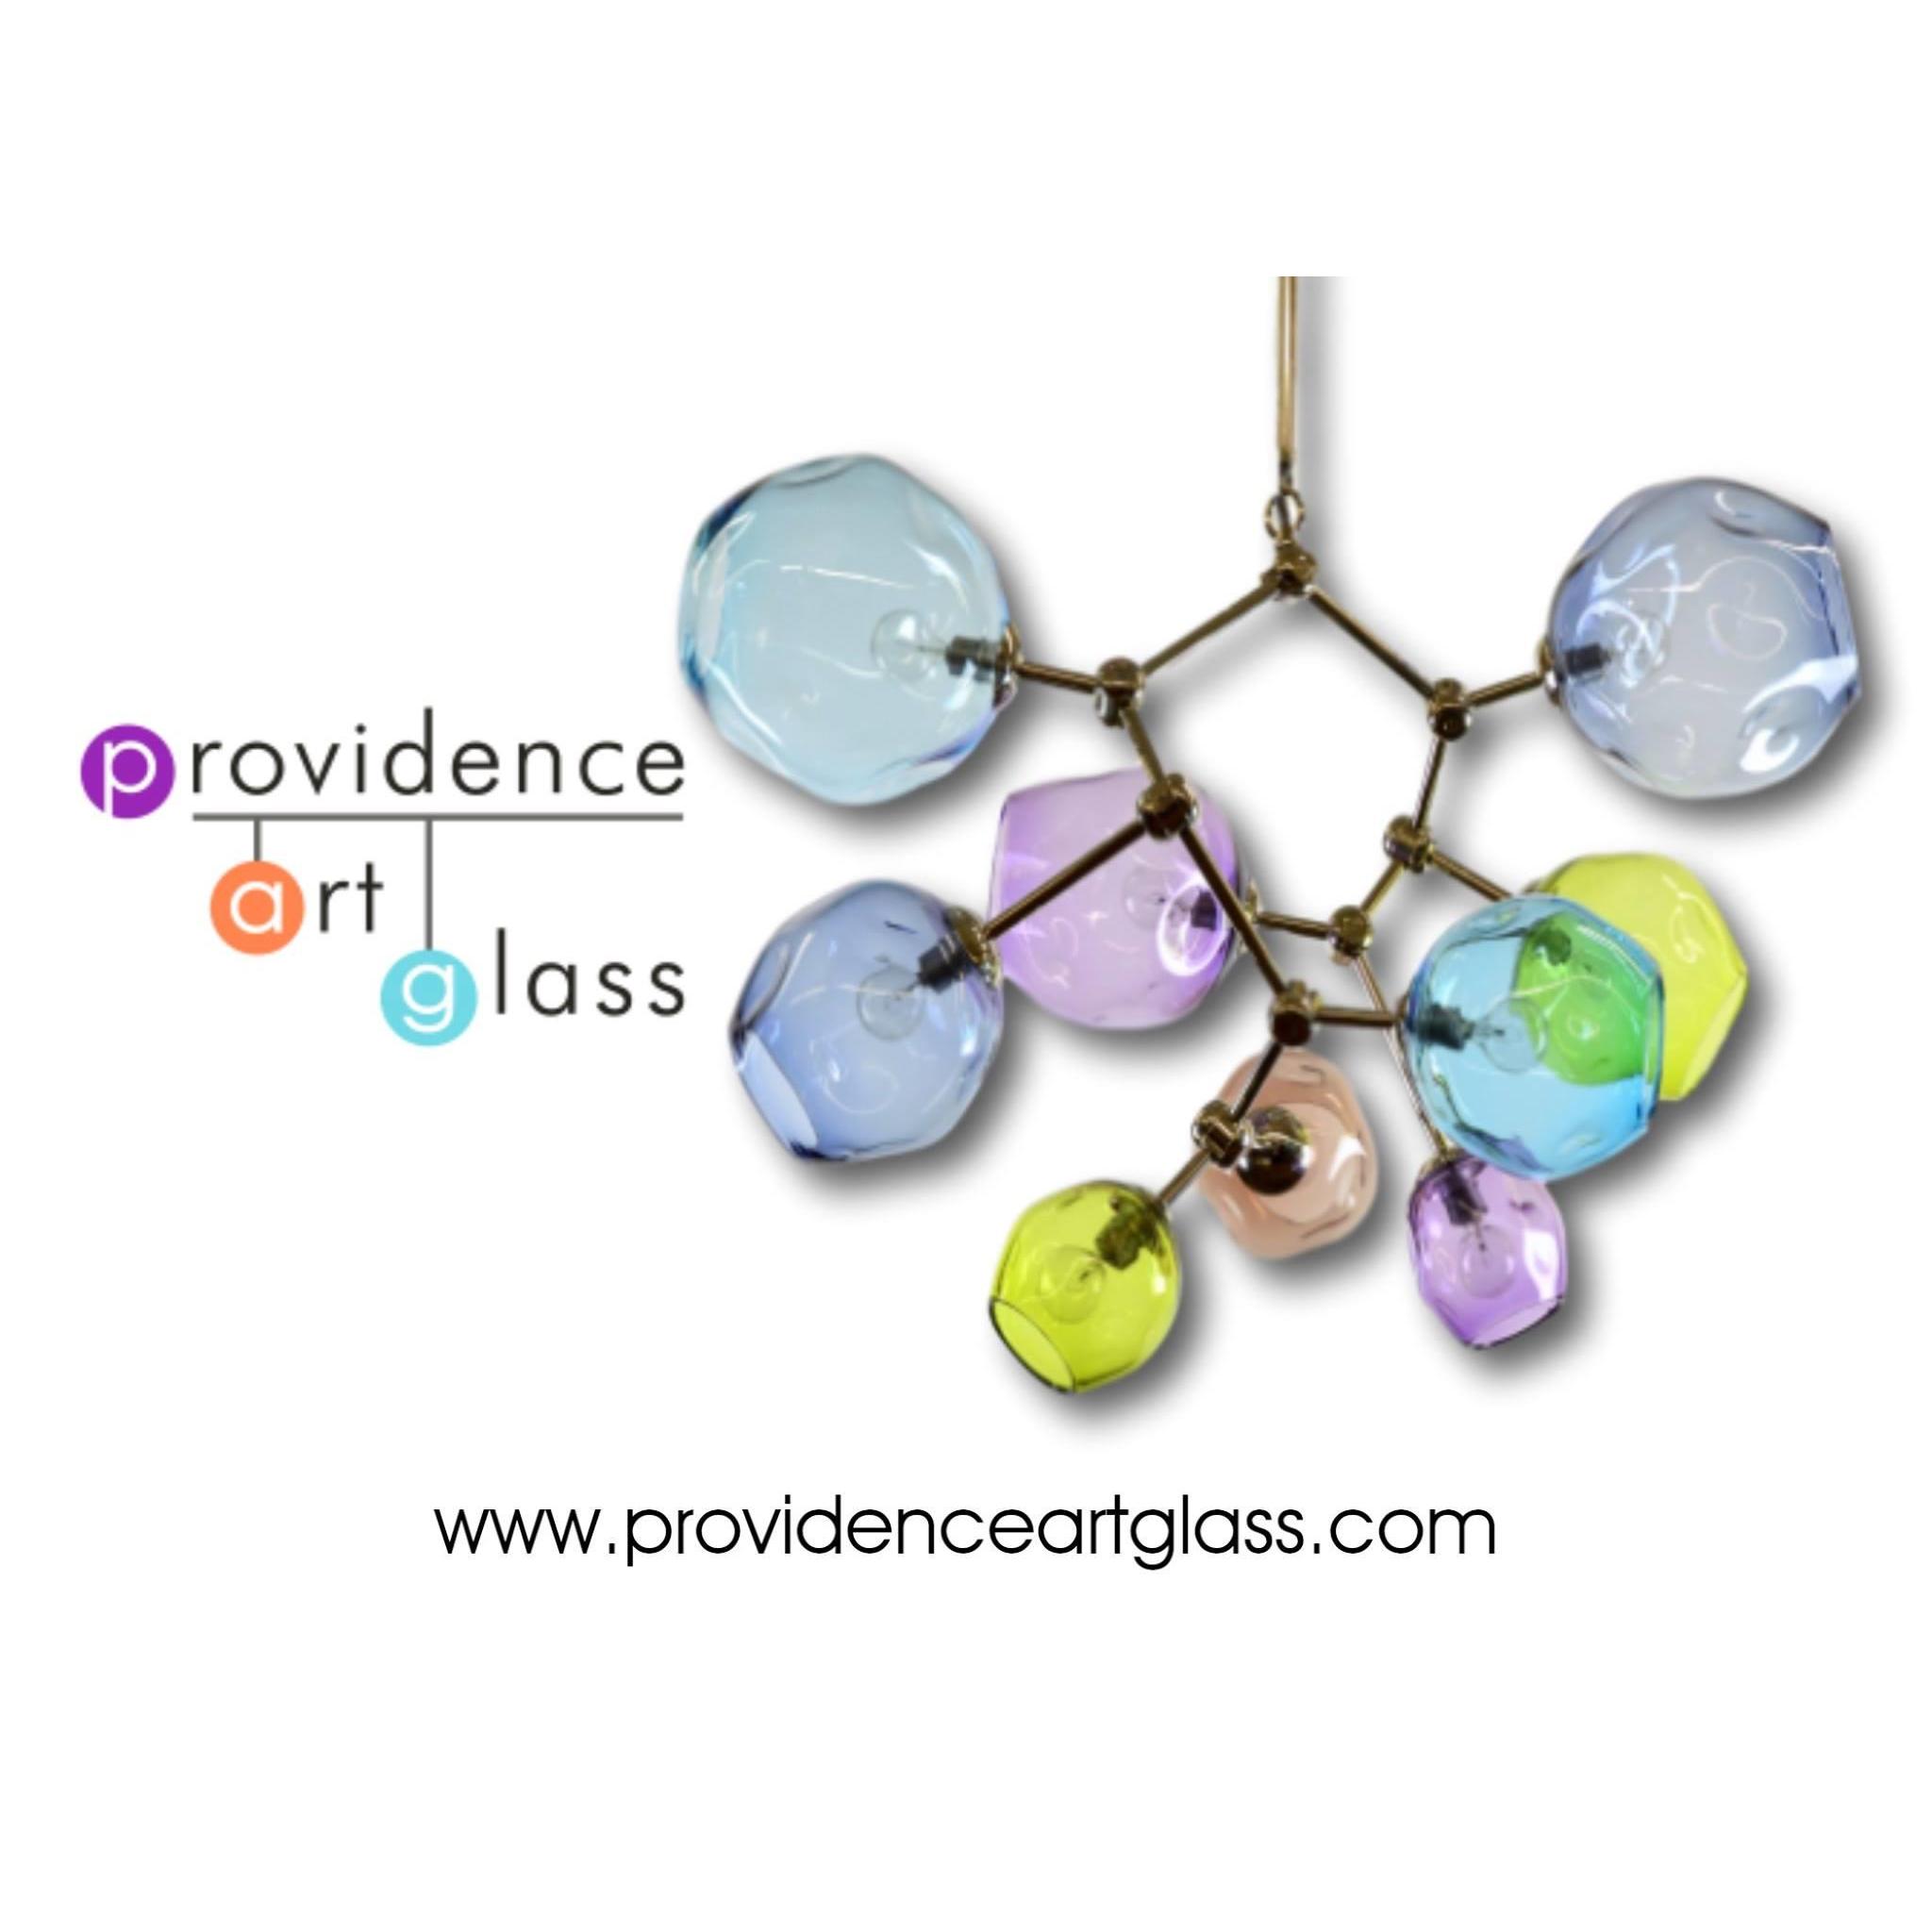 Providence Art Glass and Lighting